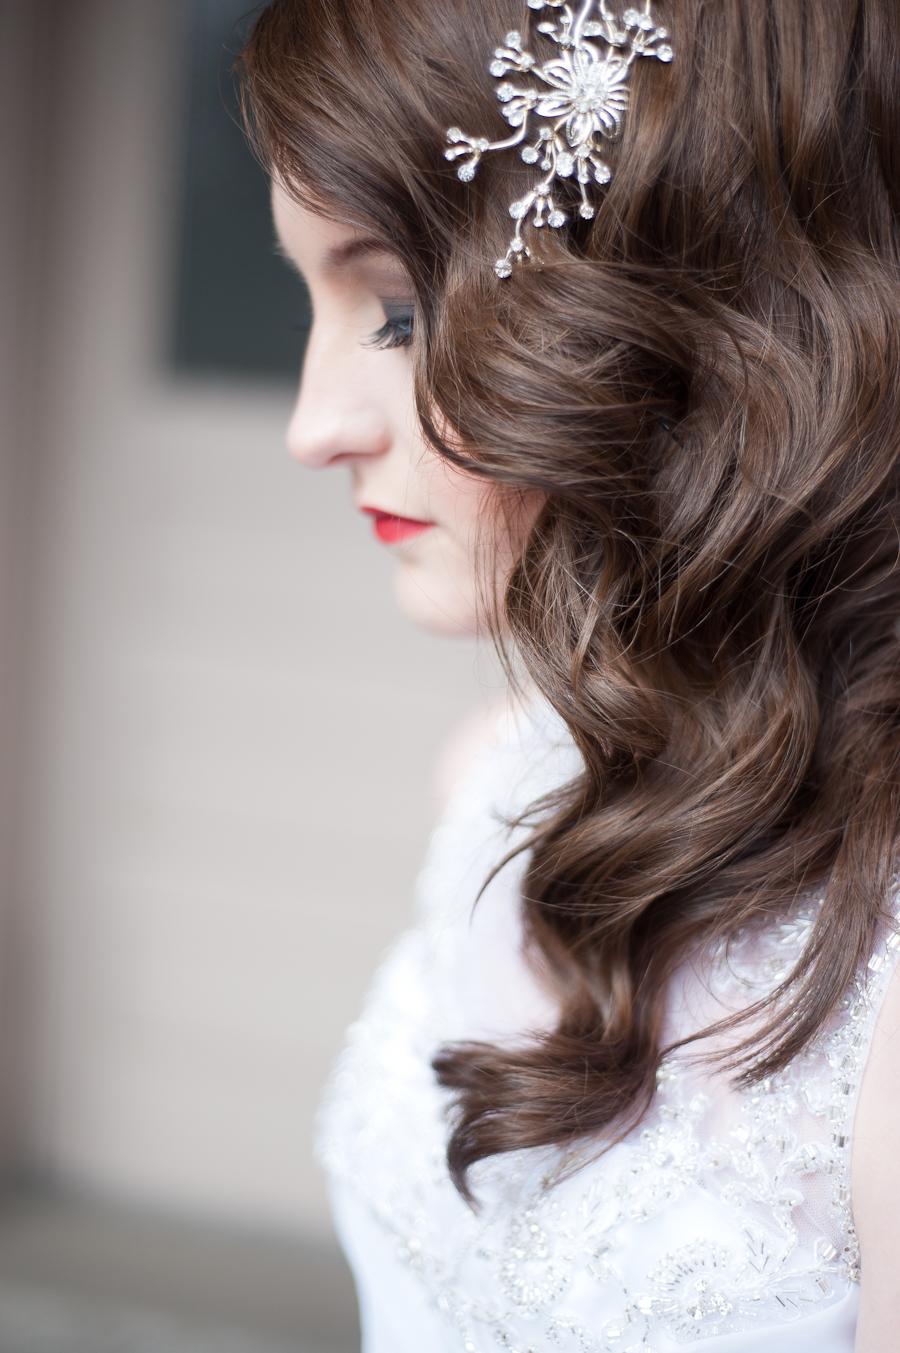 Susannah_Deangelo_Antique_Silver_Music_Hall_Wedding-9.jpg